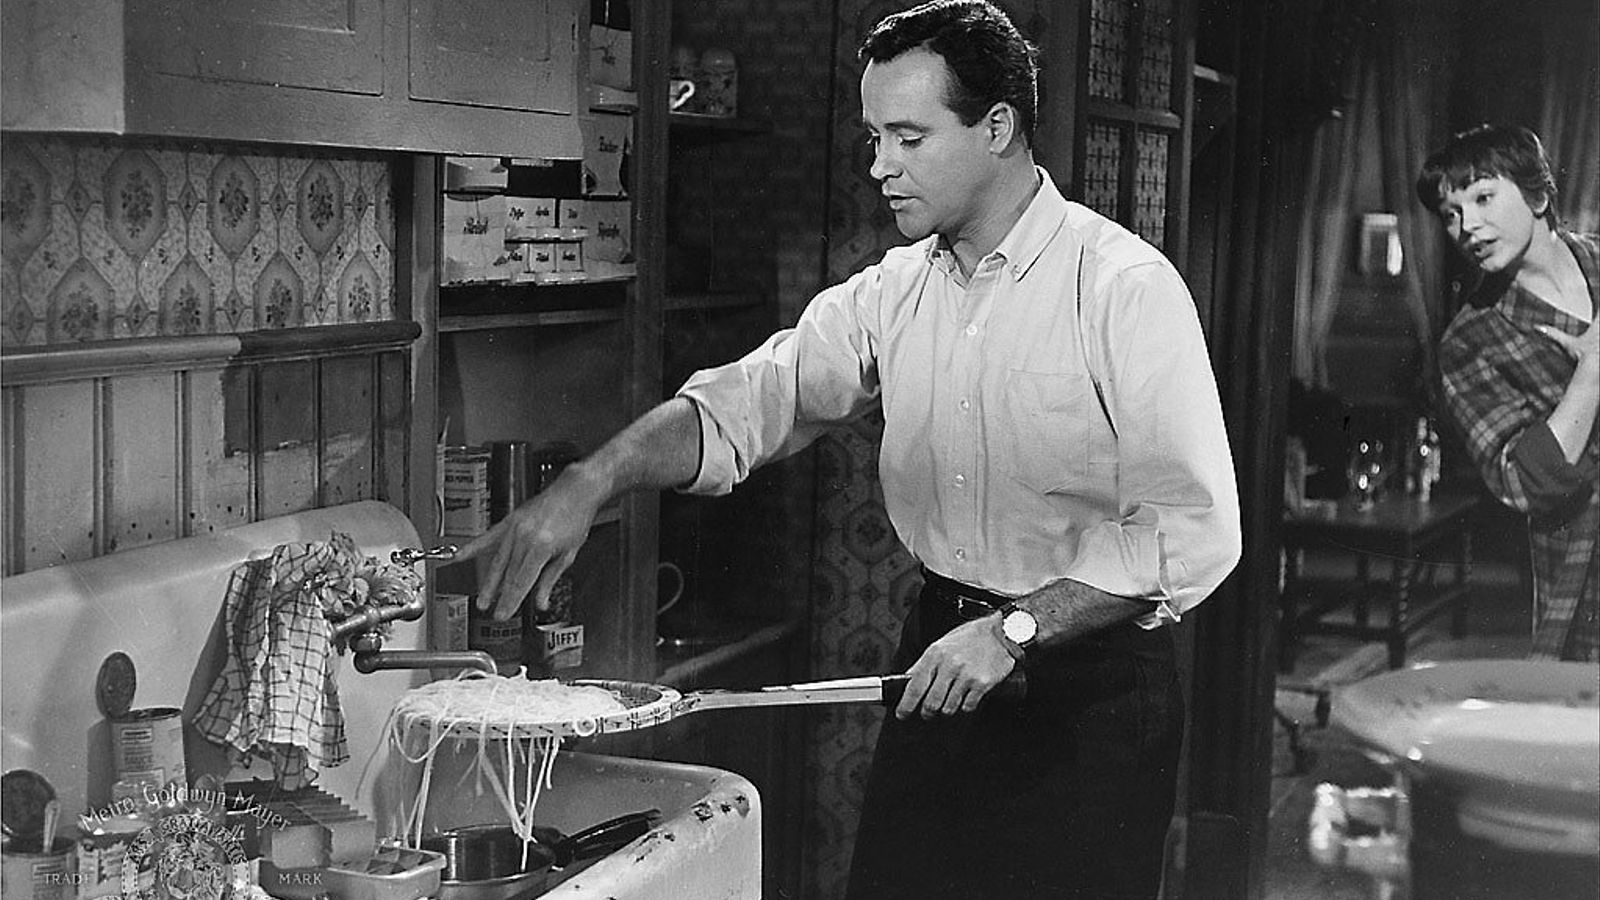 L'apartament, dirigida per Billy Wilder i protagonitzada per Jack Lemmon I Shirley MacLaine.